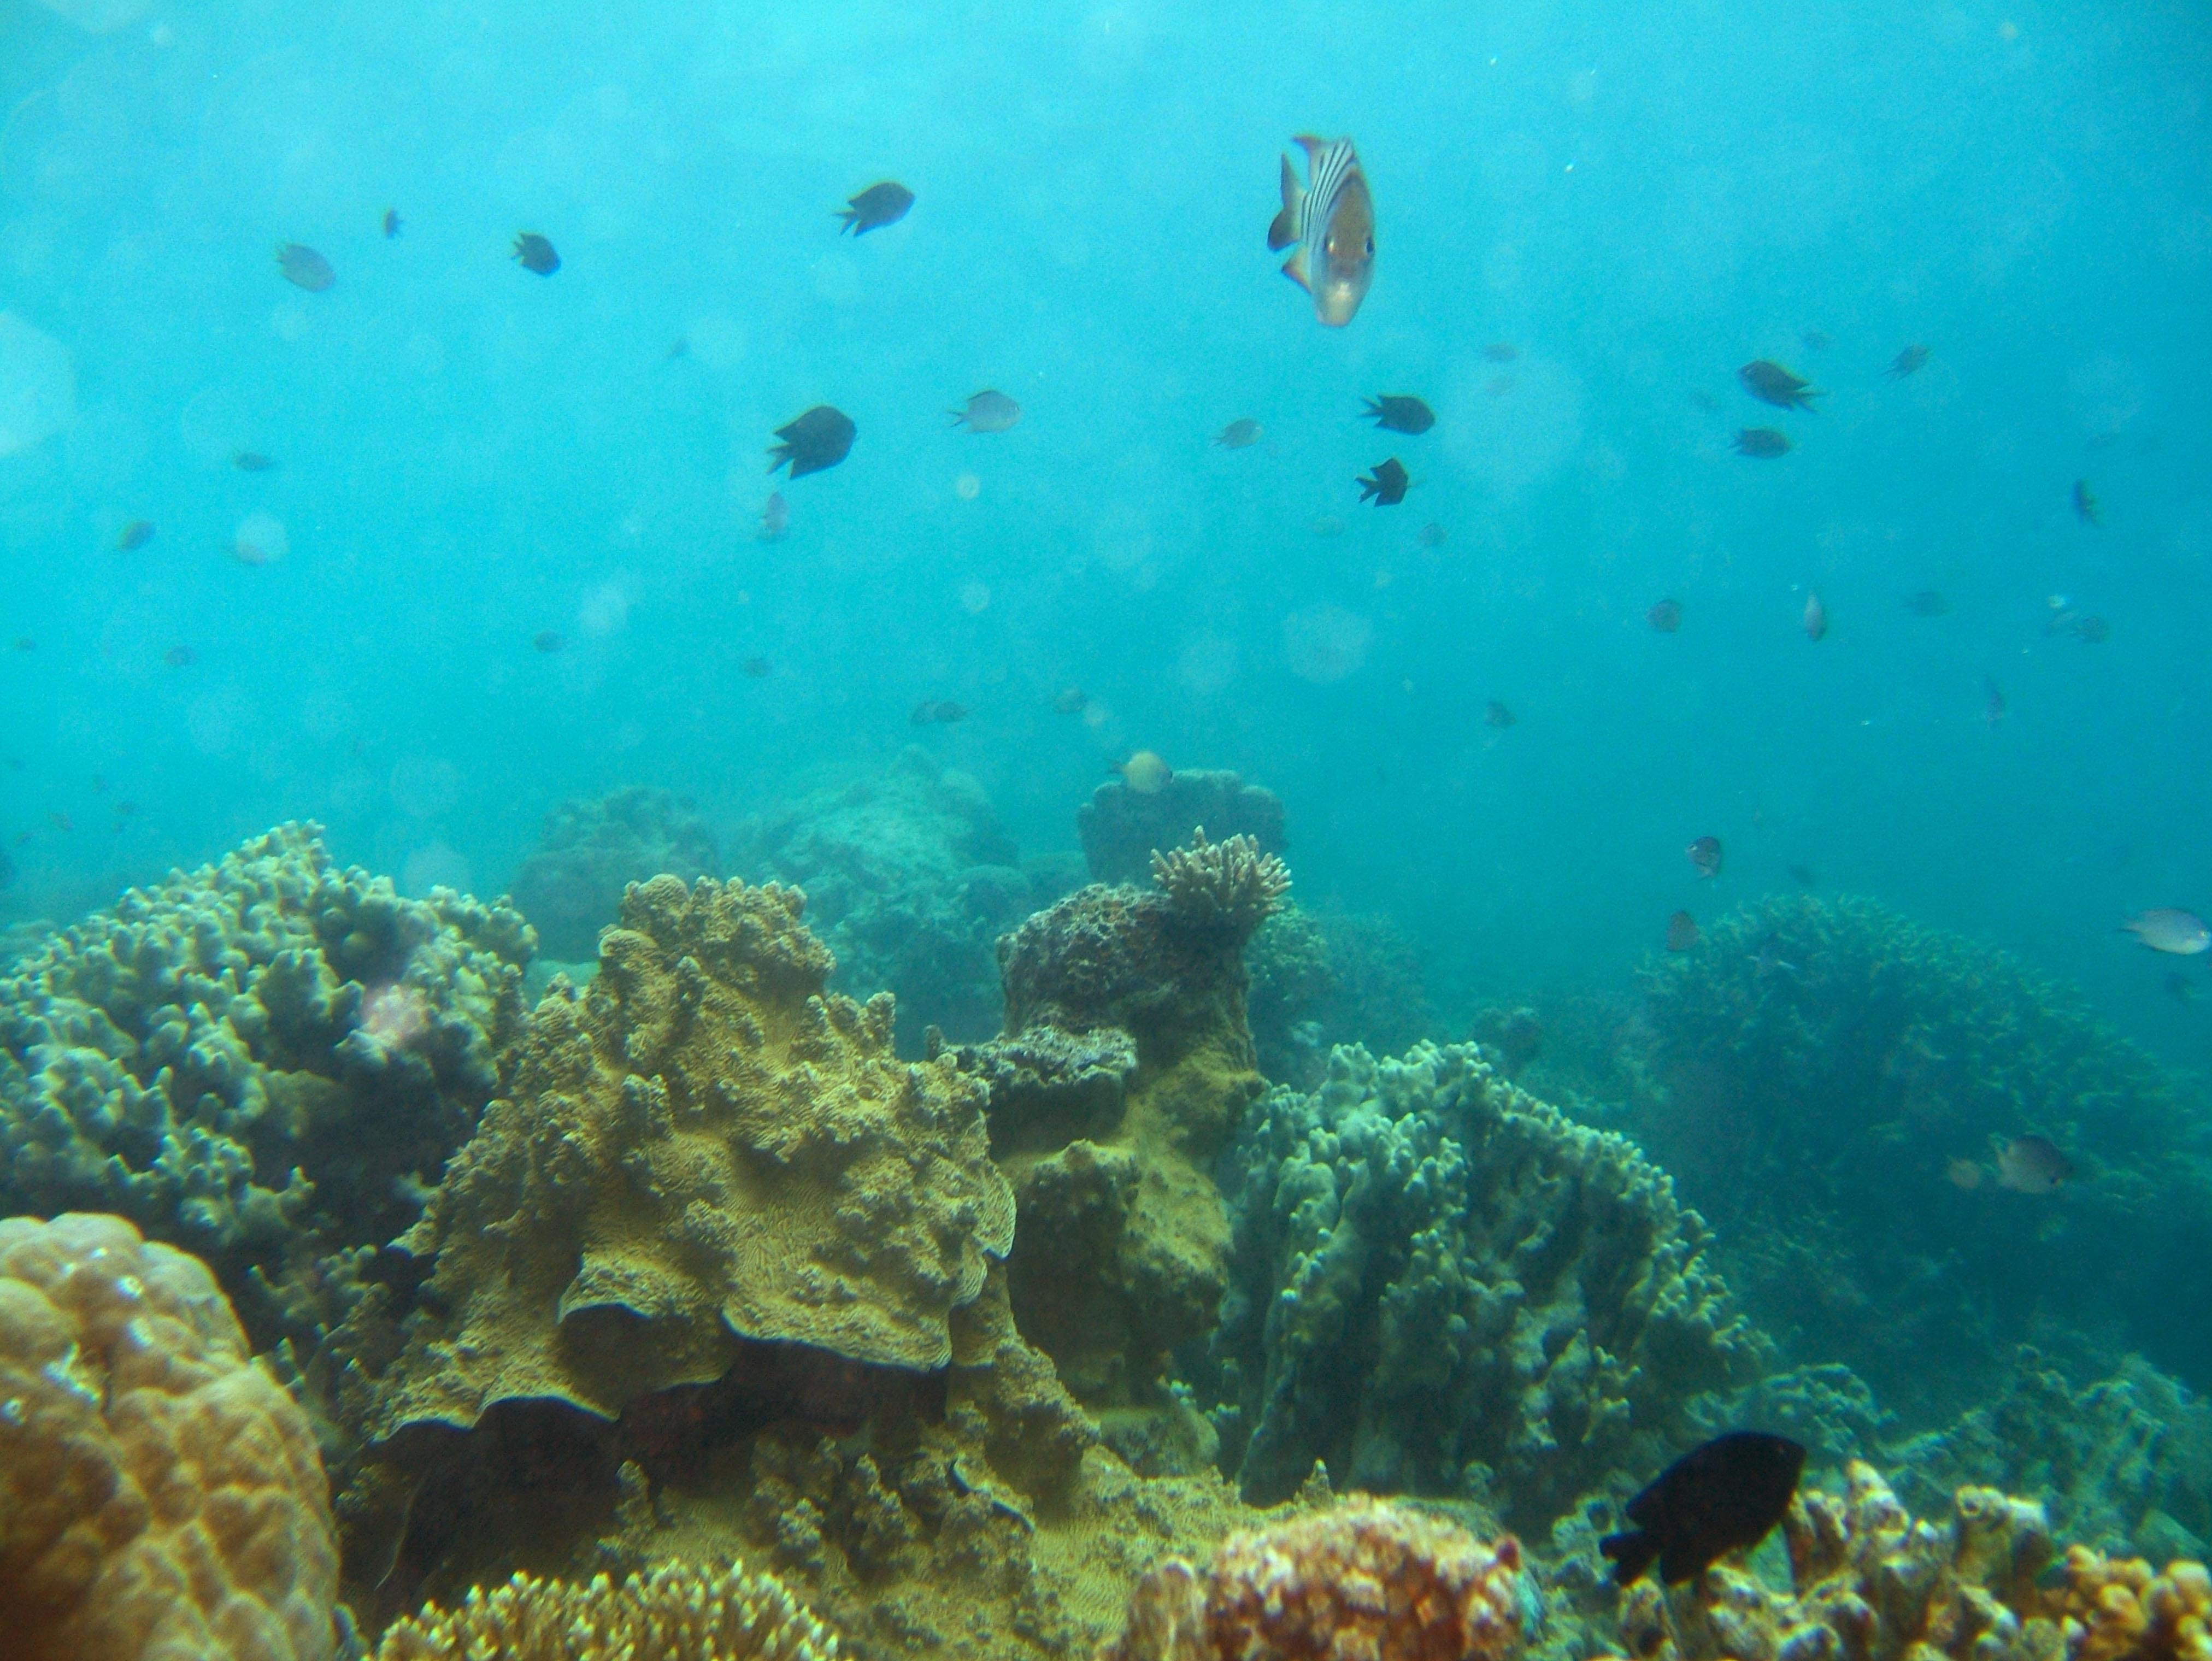 Coron dive site 11 Cay Angan Lake Baracuda Lake July 2005 29